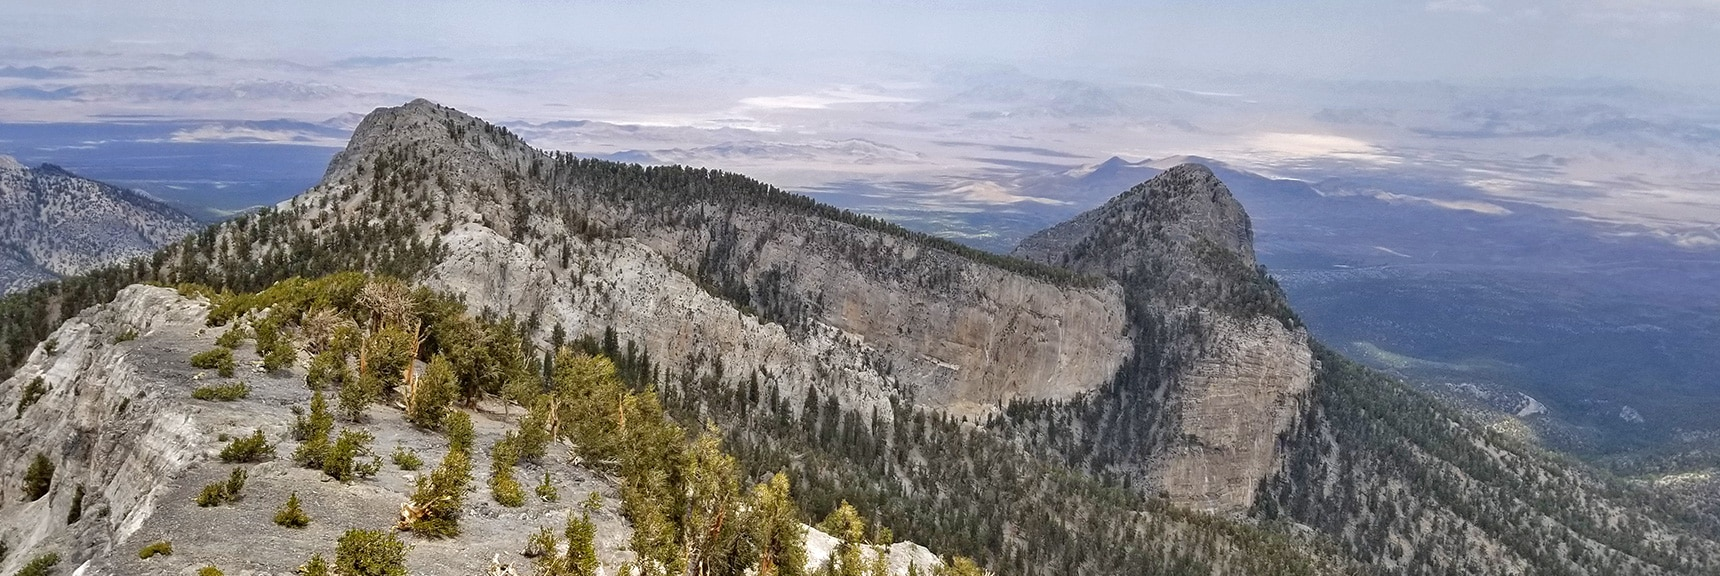 View of Mummy Mountain Head   Mummy Mountain Northern Rim Overlook   Las Vegas Area Trails